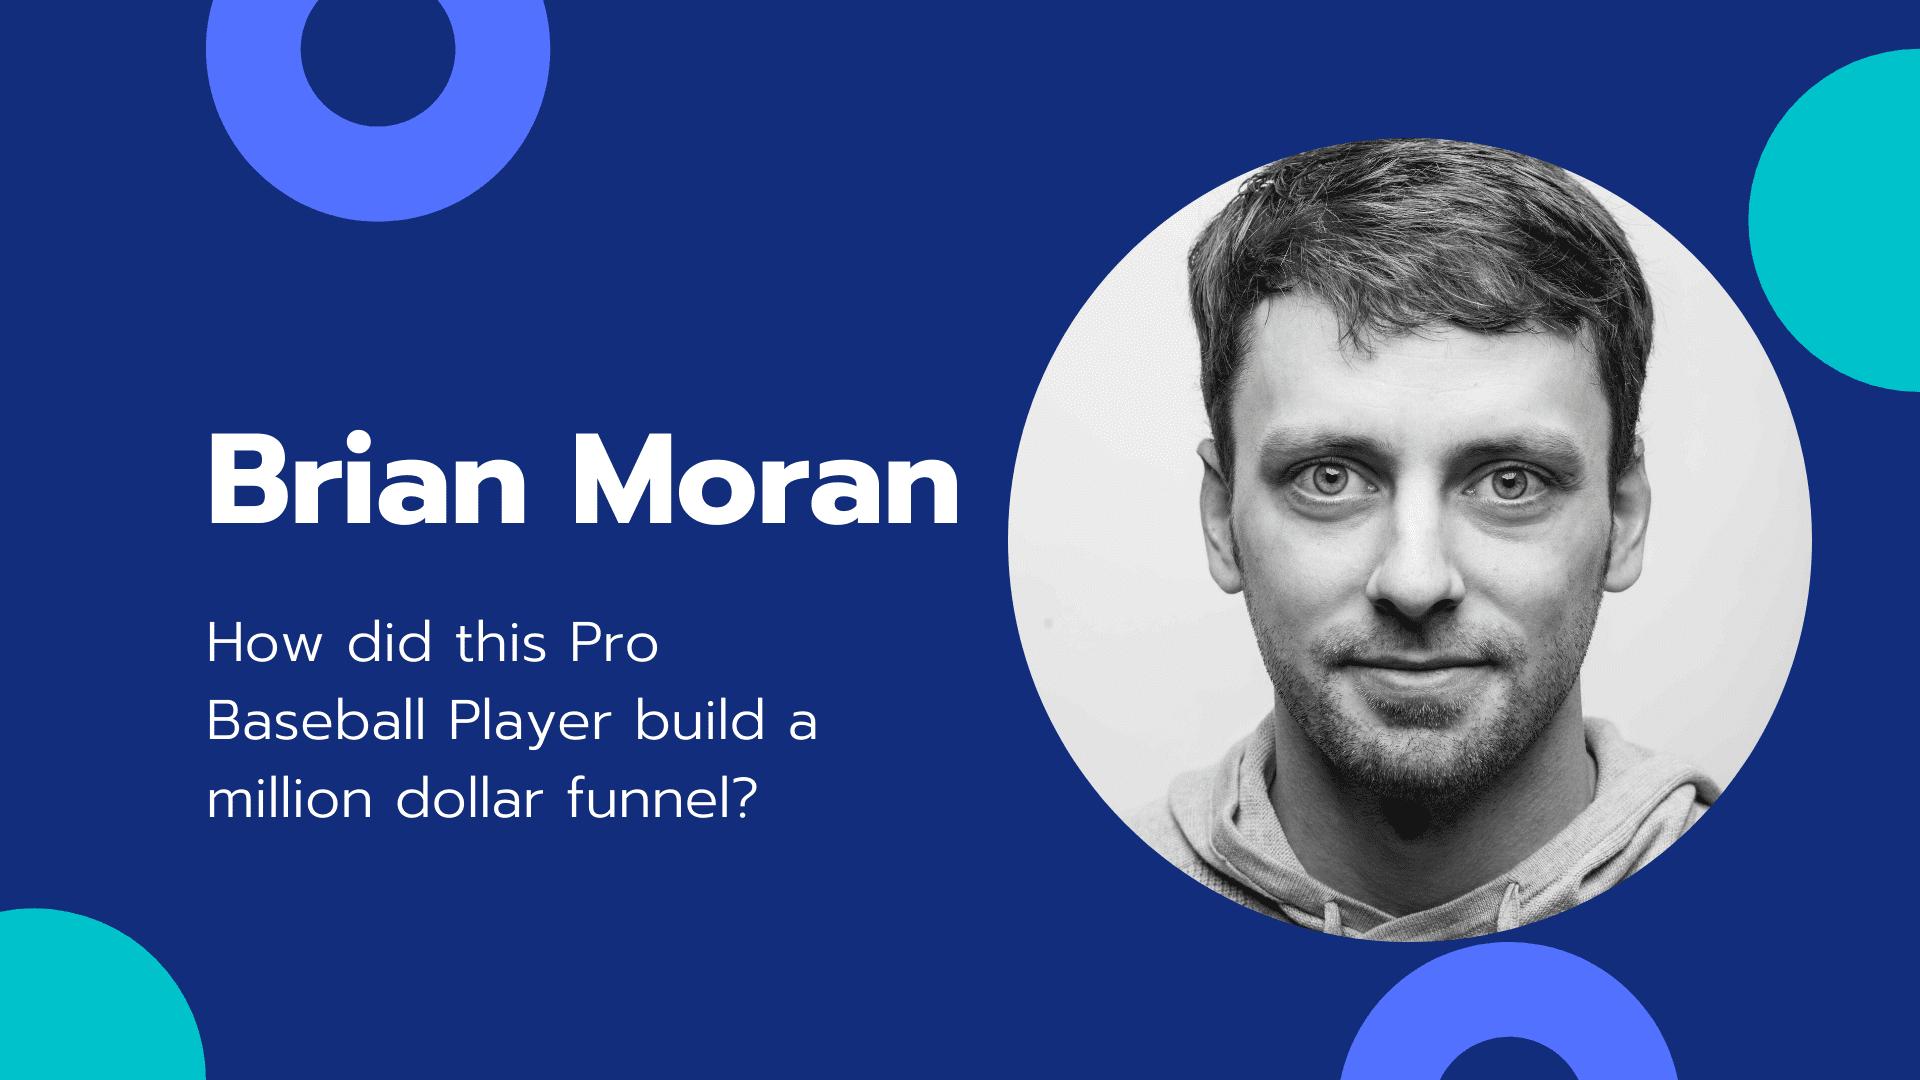 Brian Moran